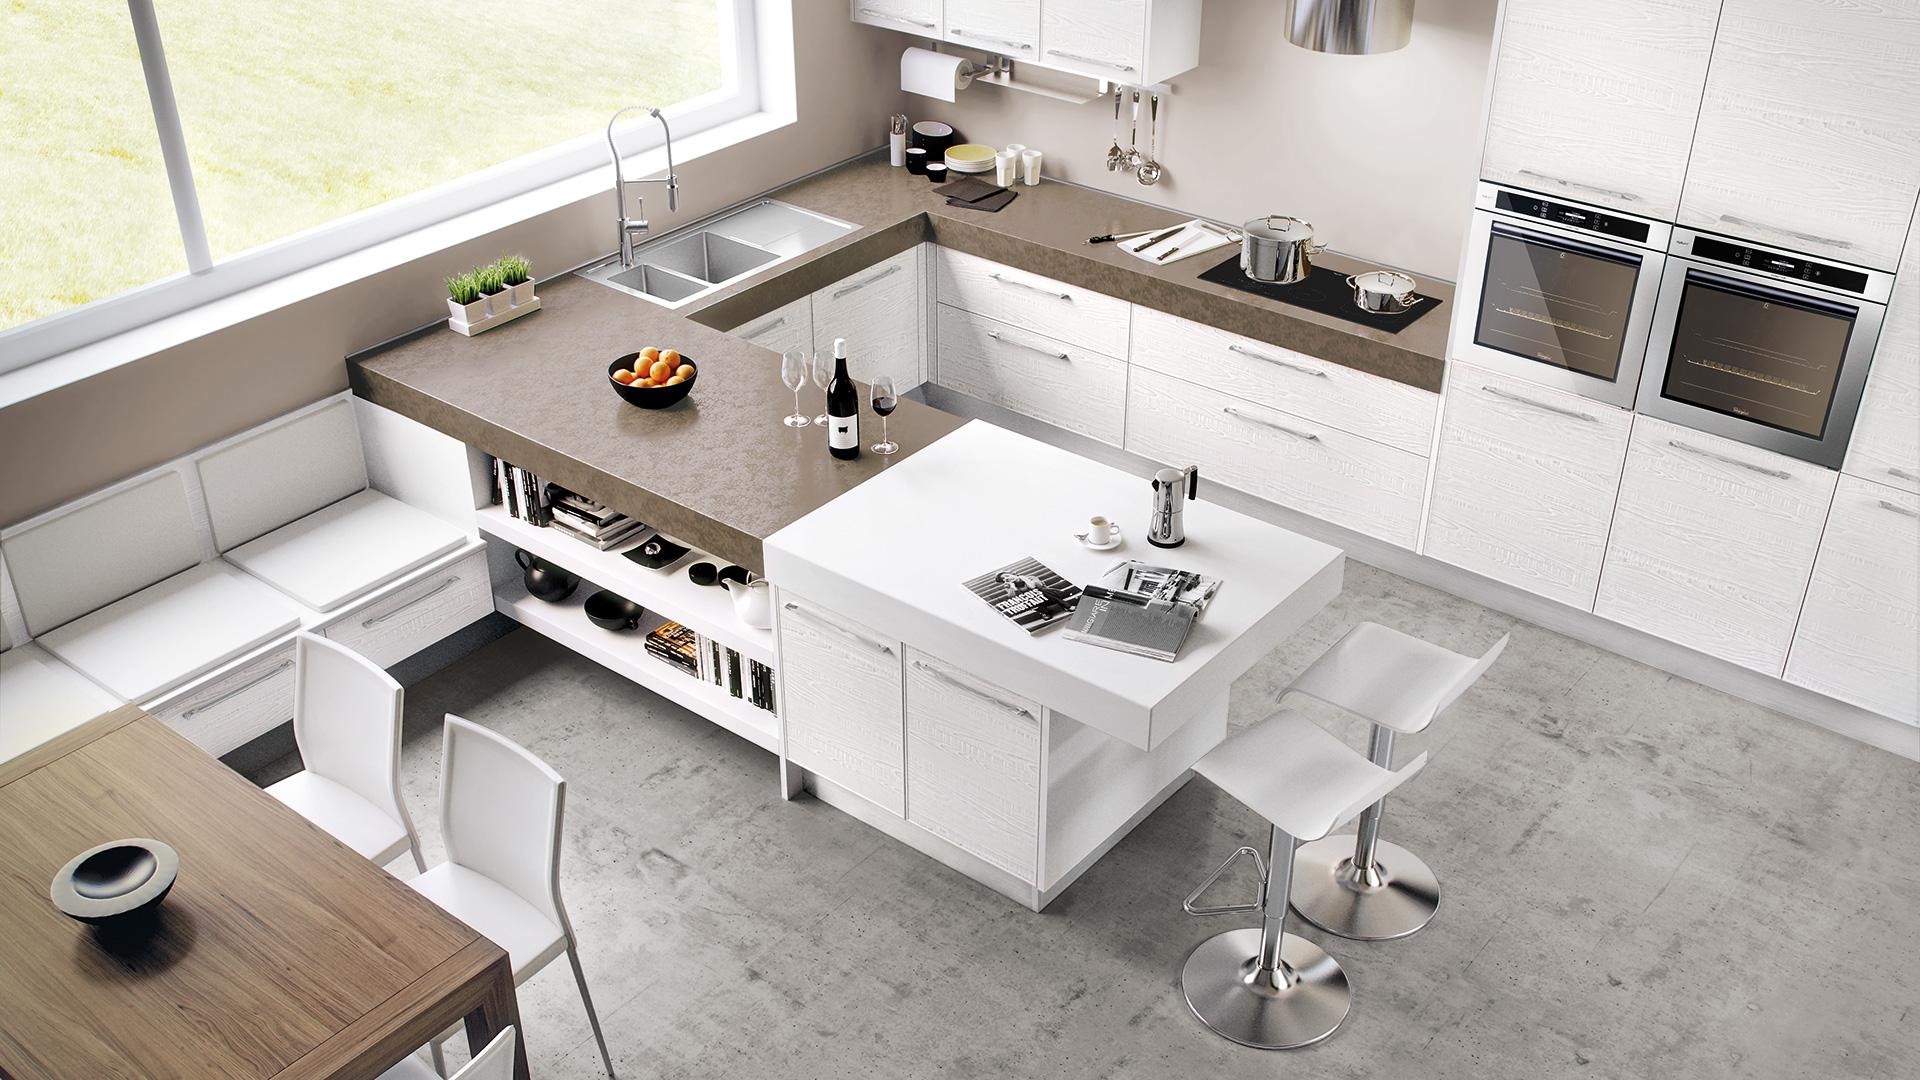 Cucine Moderne Con Isola Lube. Awesome Gallery Of Cucine Lube Per La ...